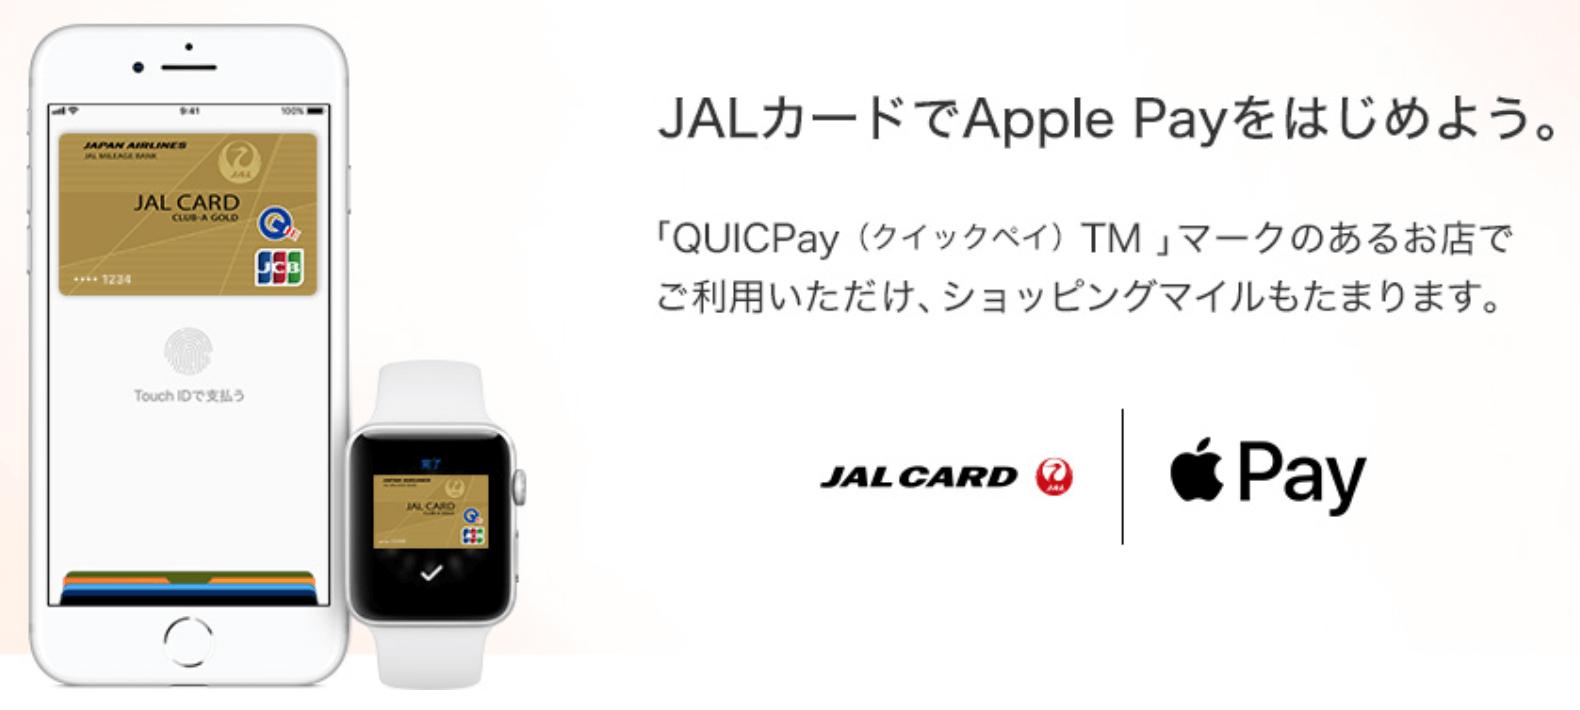 JALカードSuica CLUB-AゴールドカードはApple Payに対応